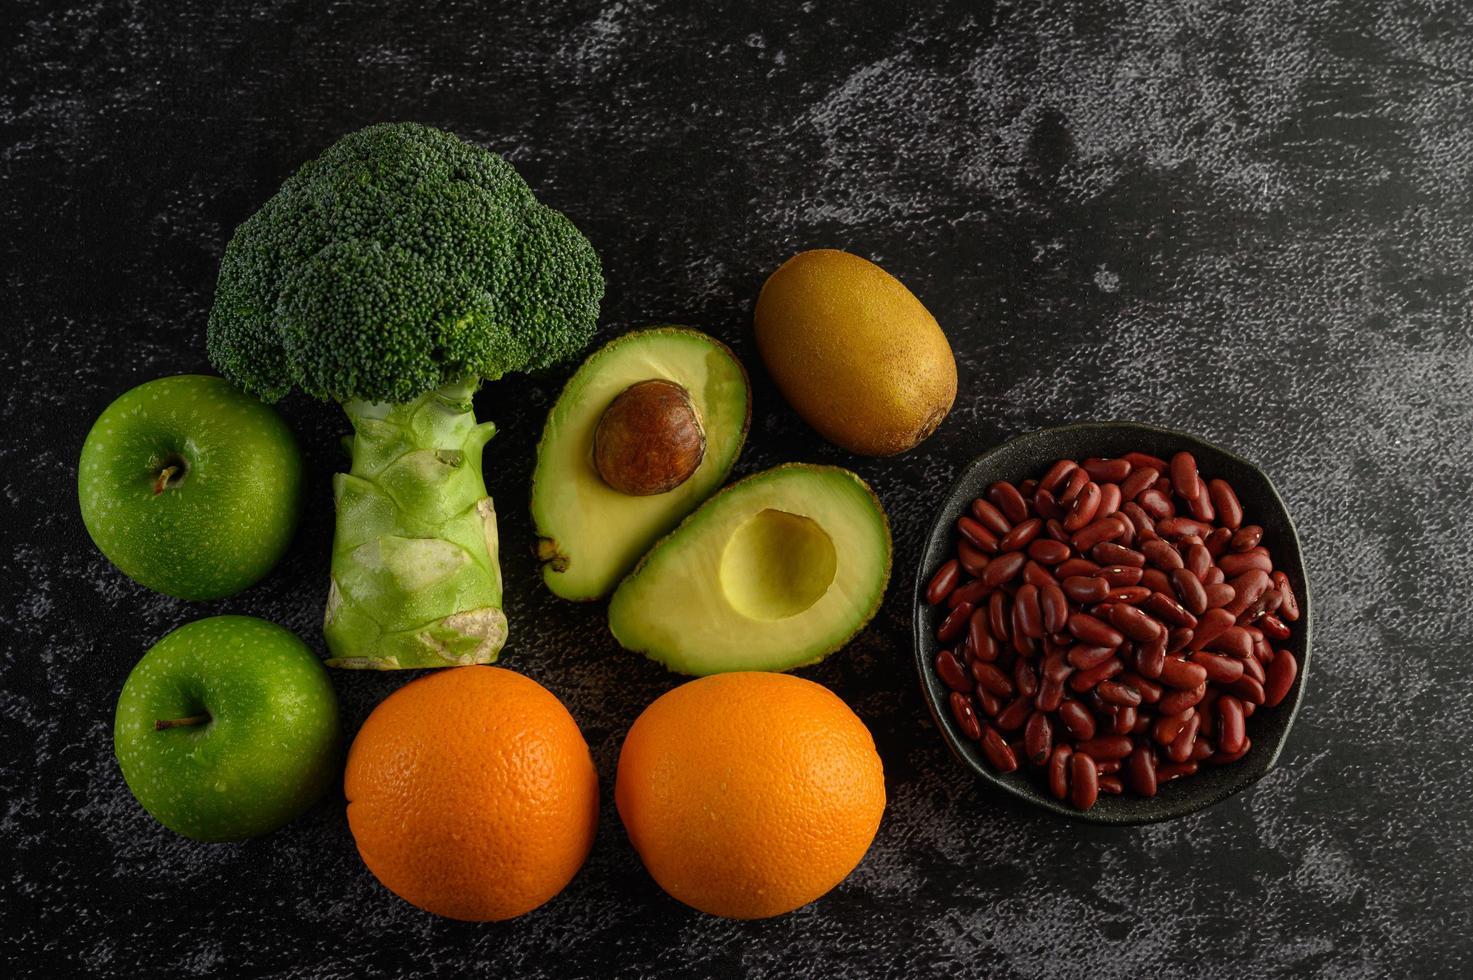 Broccoli, apple, orange, kiwi, avocado and beans on a black cement floor background photo